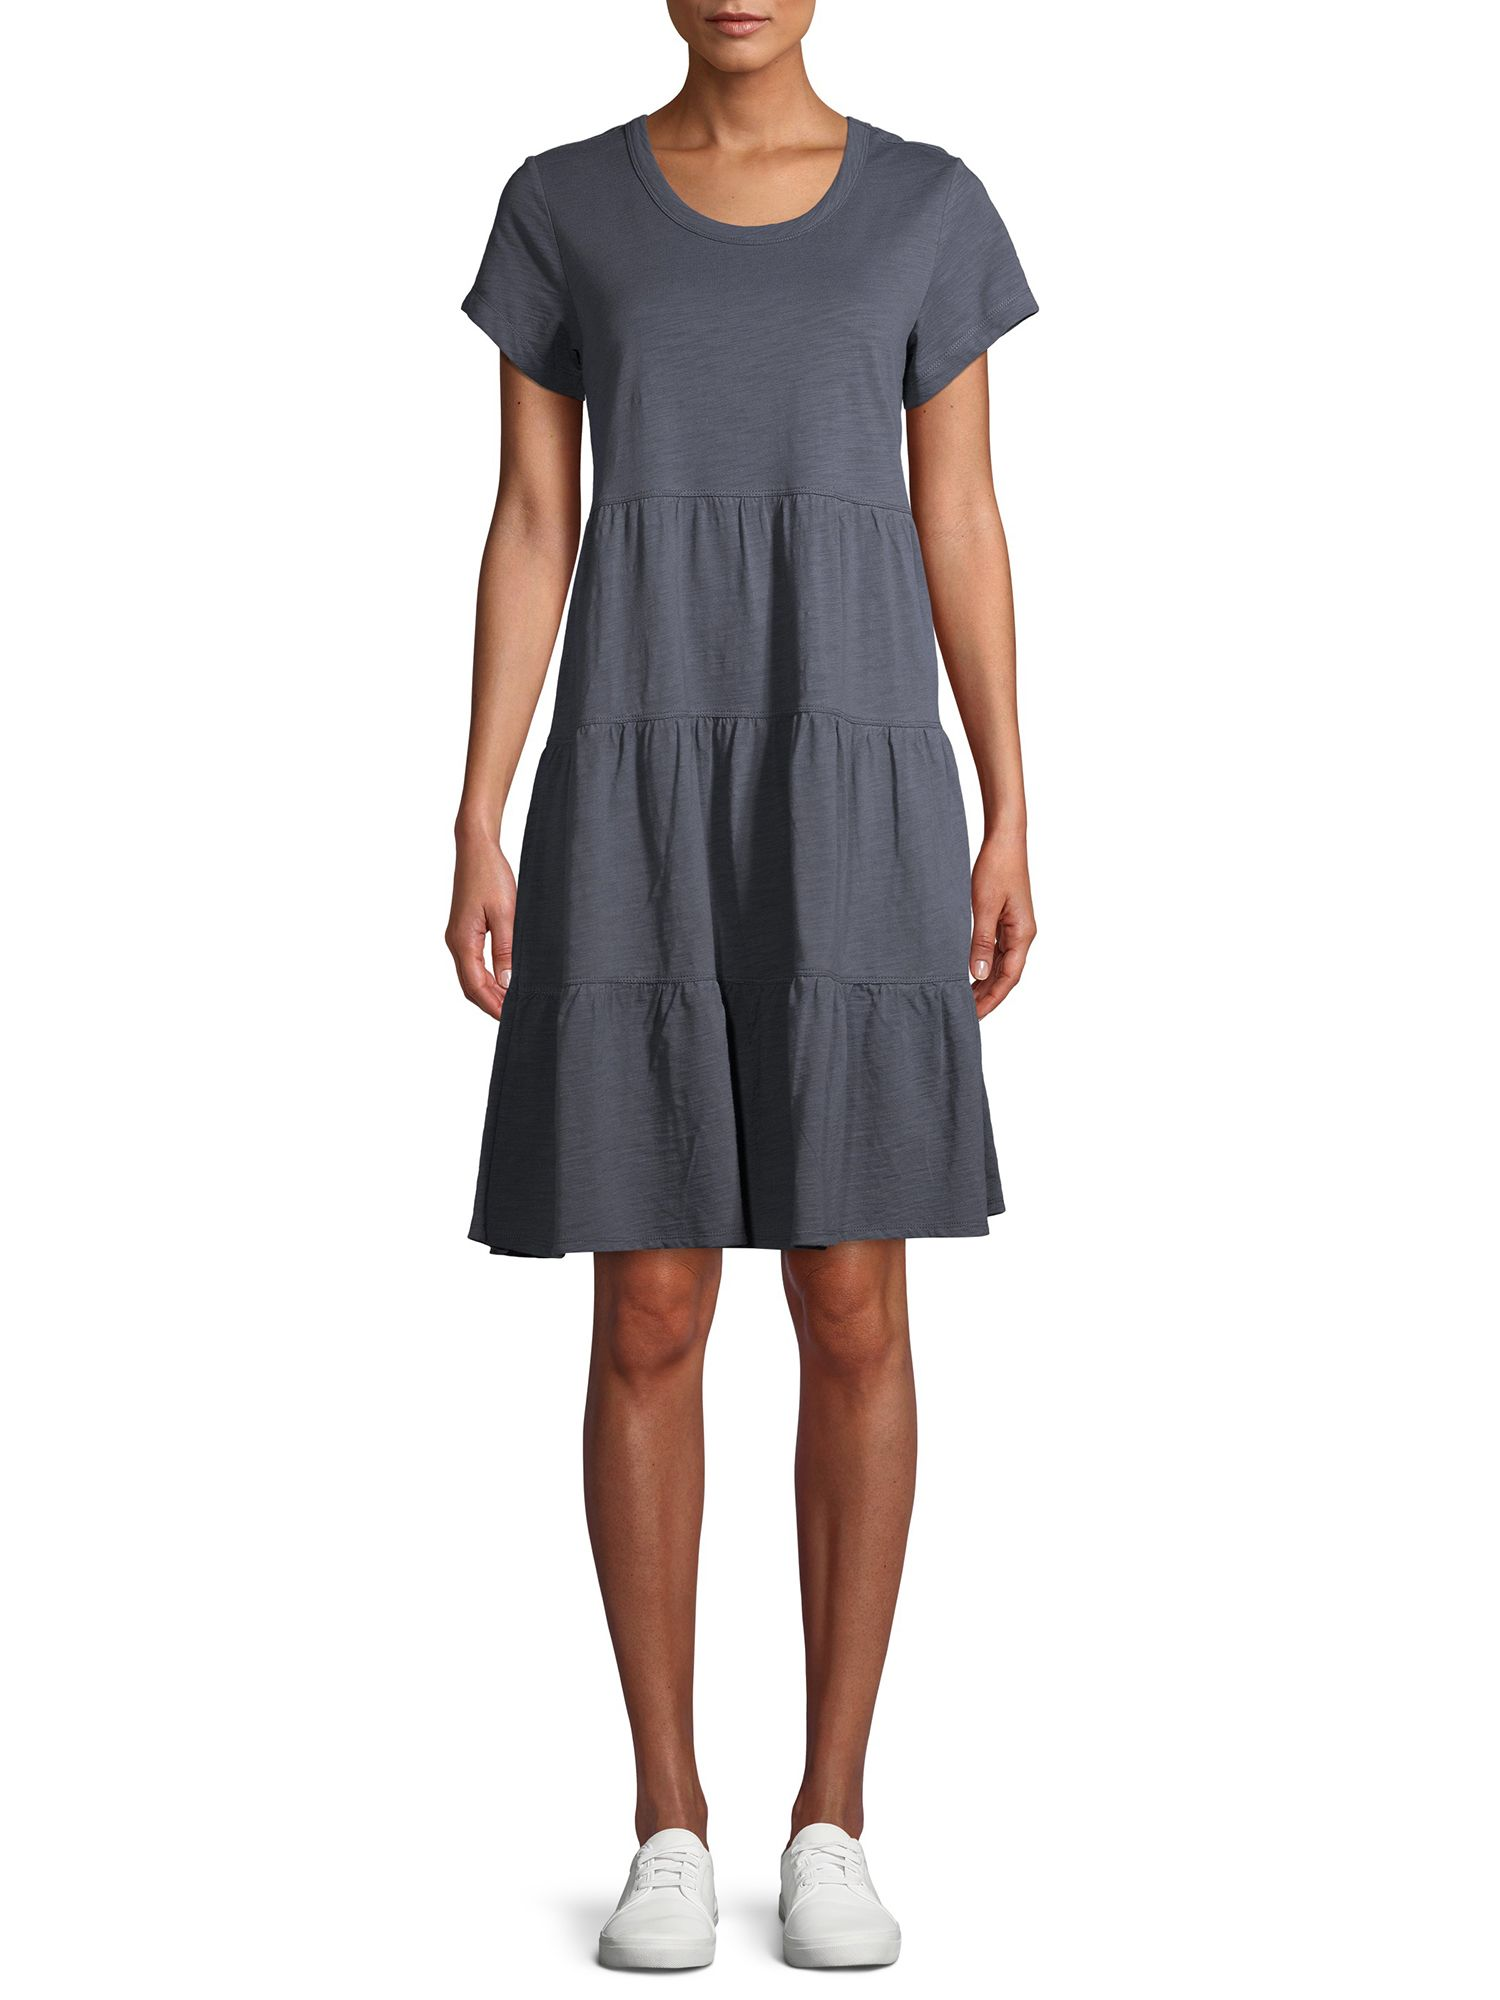 Time And Tru Time And Tru Women S Tiered Knit Dress Walmart Com In 2021 Tiered Knit Dress Knit Summer Dress Knit Dress [ 2000 x 1500 Pixel ]